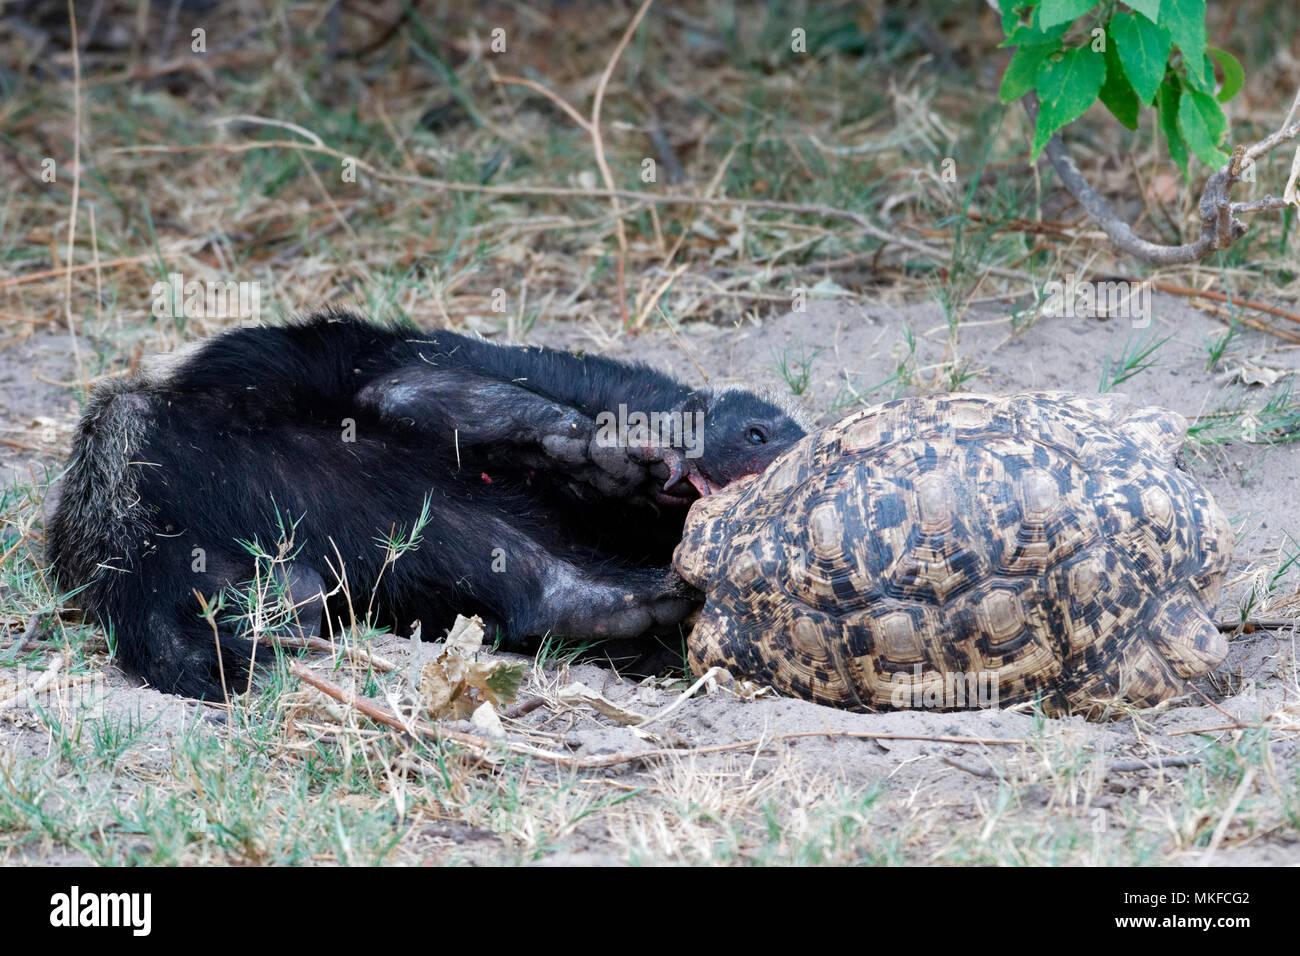 Honey badger (Mellivora capensis) eating a leopard tortoise, Botswana - Stock Image